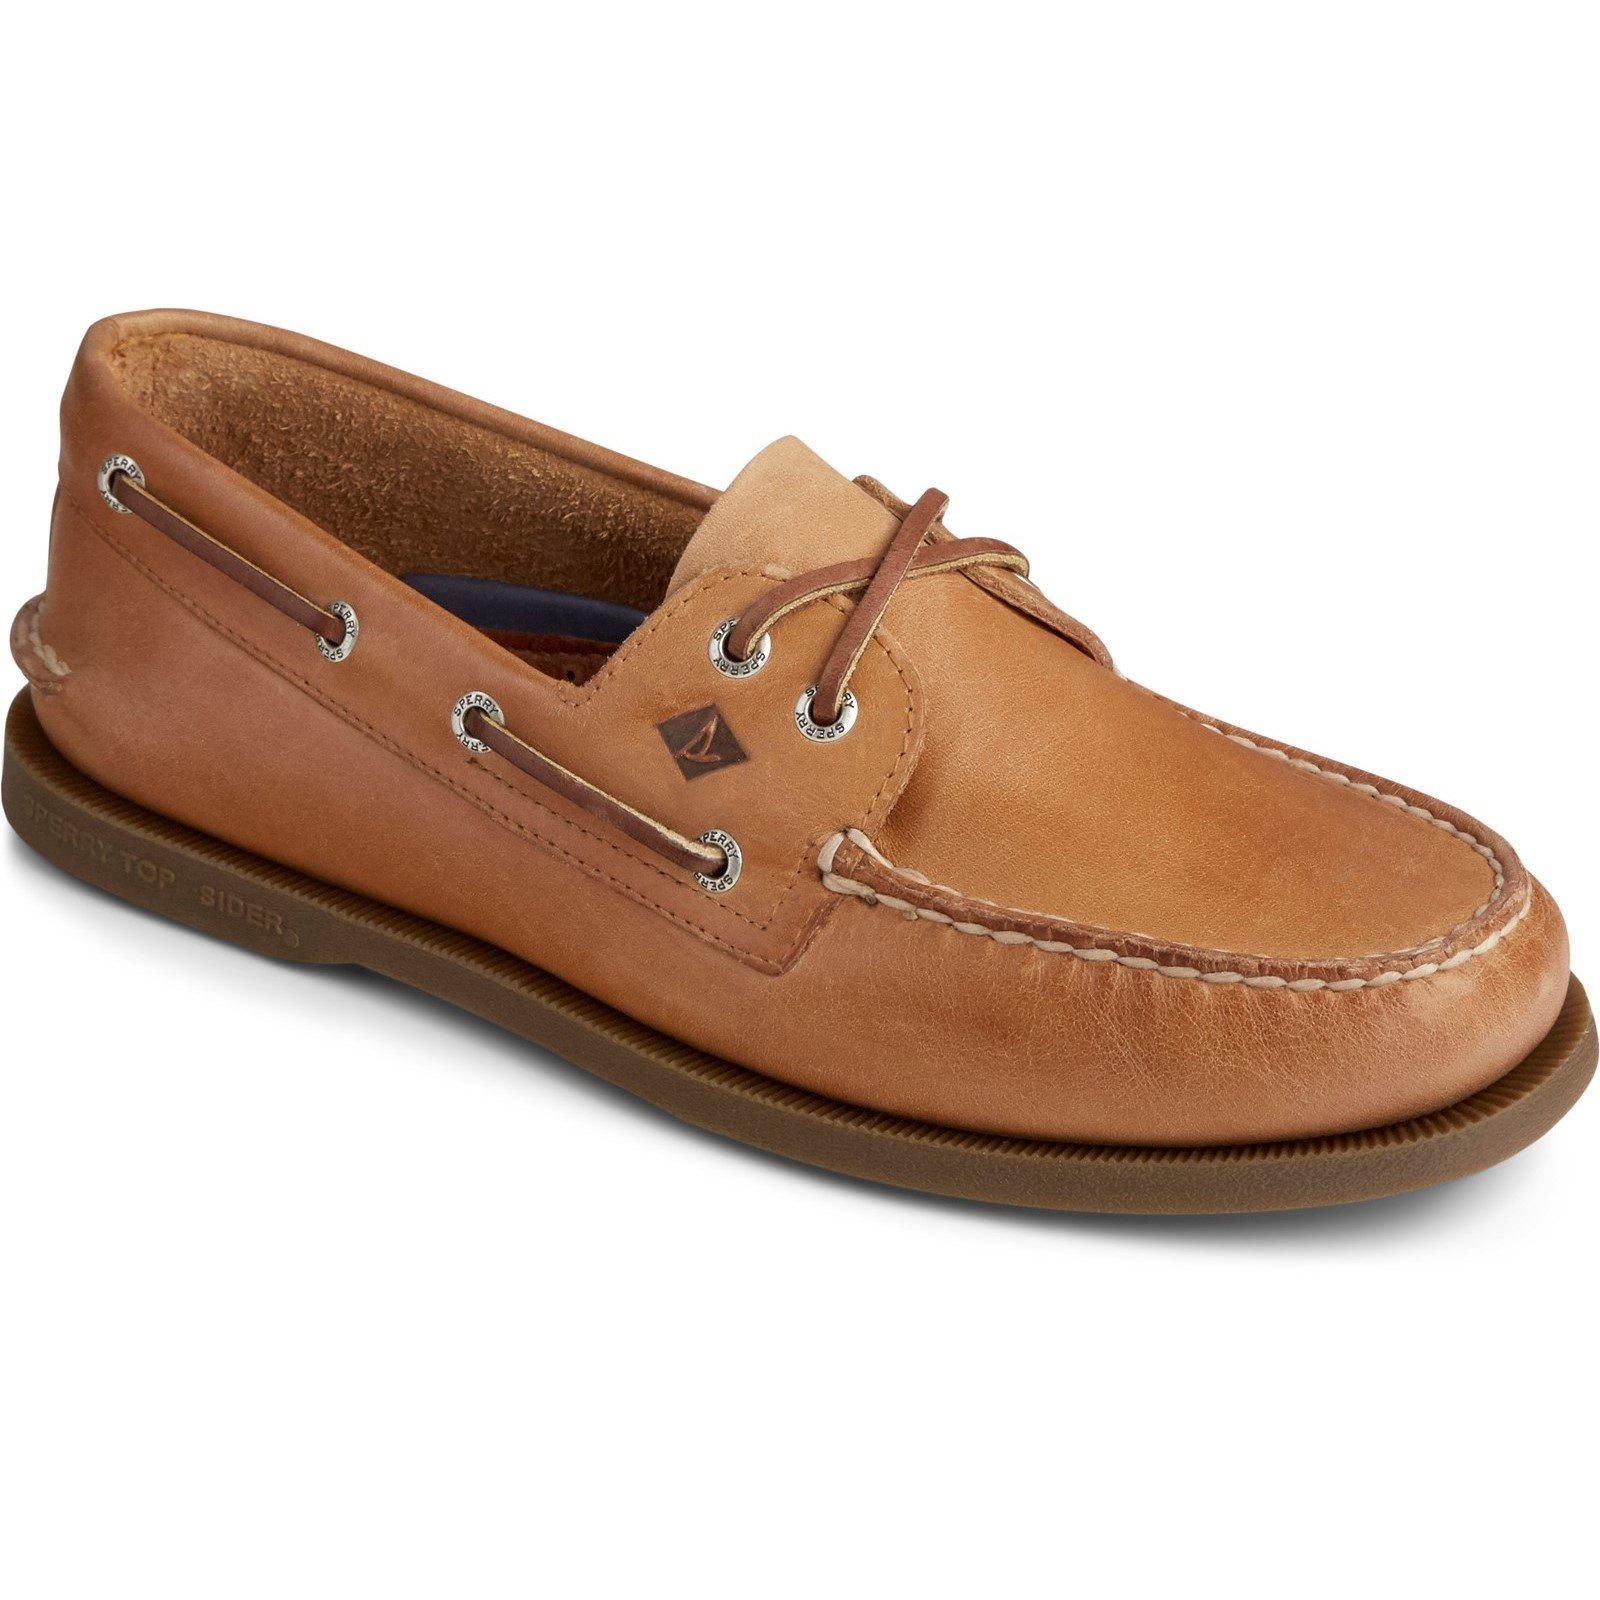 Sperry Men's Authentic Original Leather Boat Shoe Various Colours 31524 - Nutmeg 11